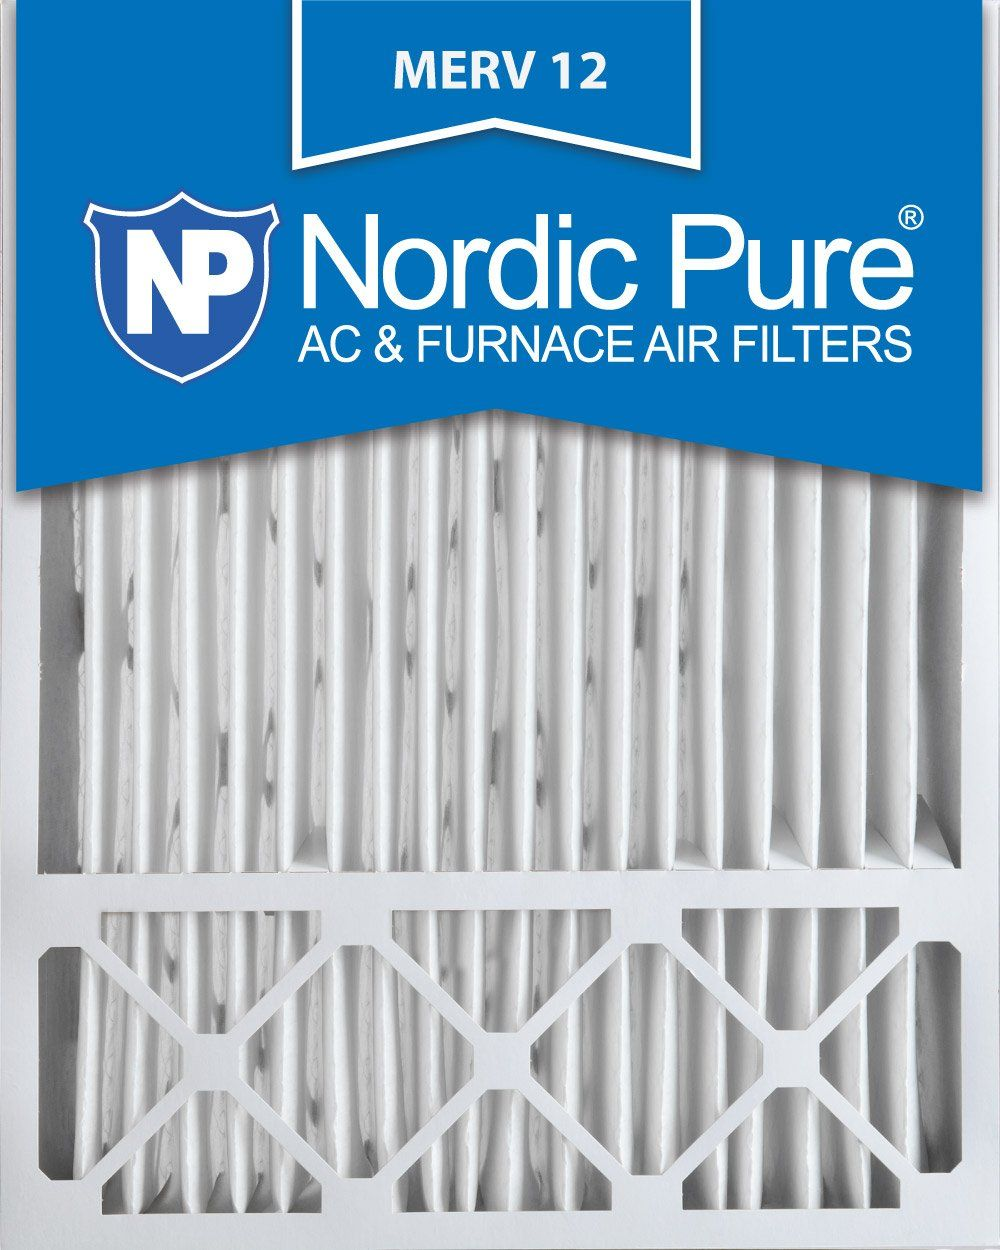 Nordic Pure 20x25x5 (43/8 Actual Depth) MERV 12 Lennox